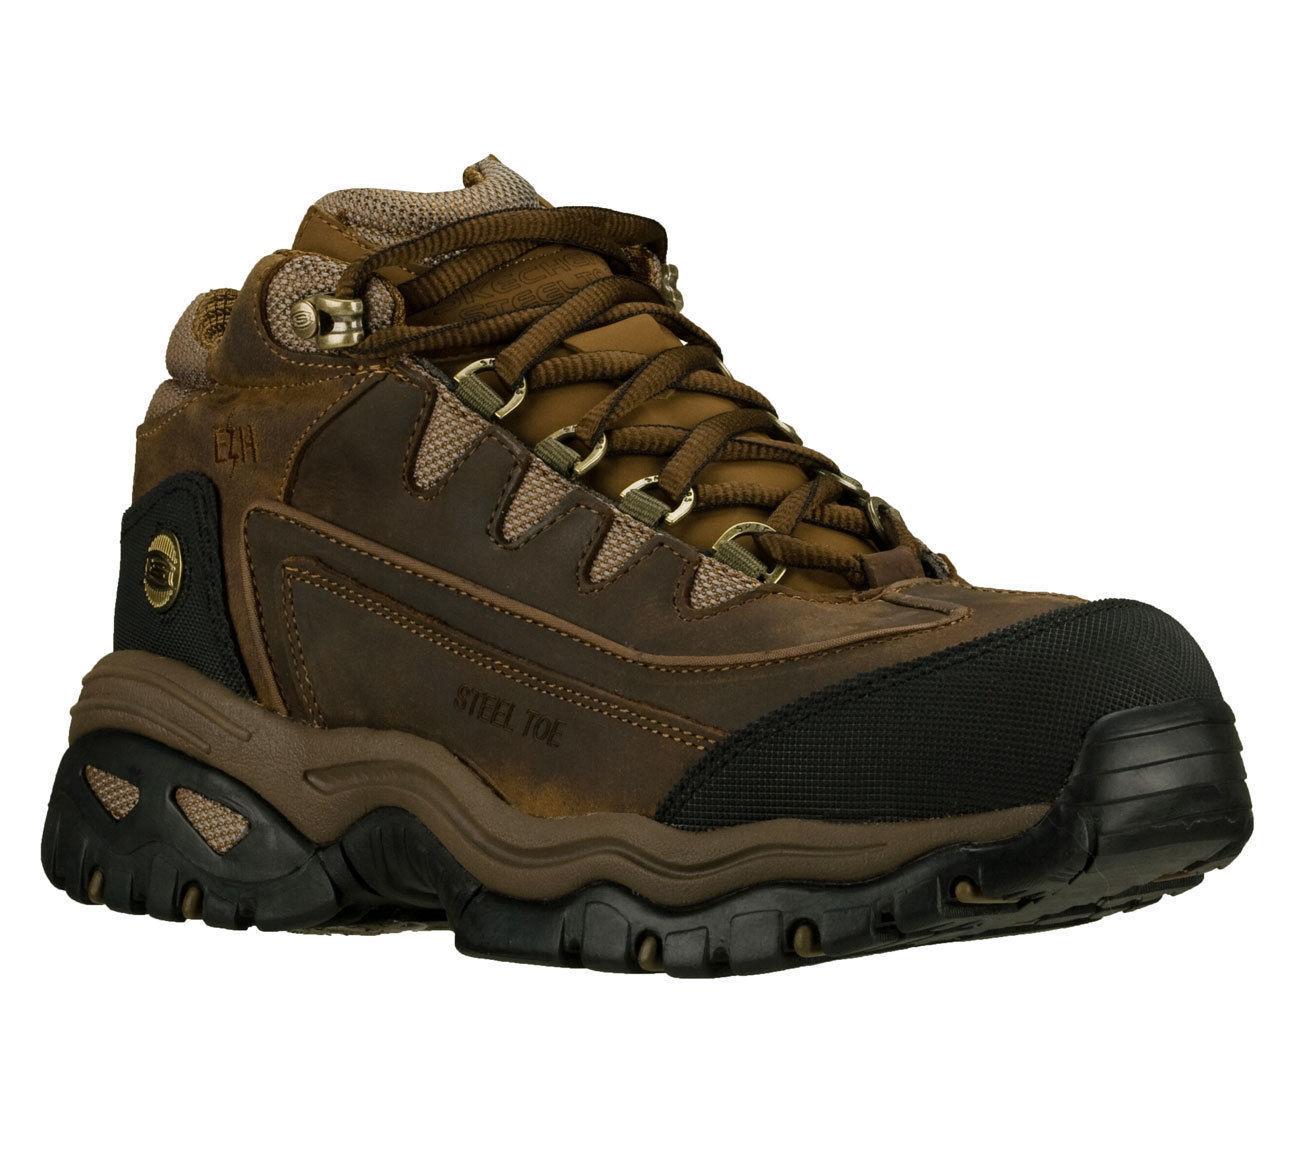 76068 Skechers Para Hombre Energy-azul Ridge botas De Trabajo Puntera De Acero Cha